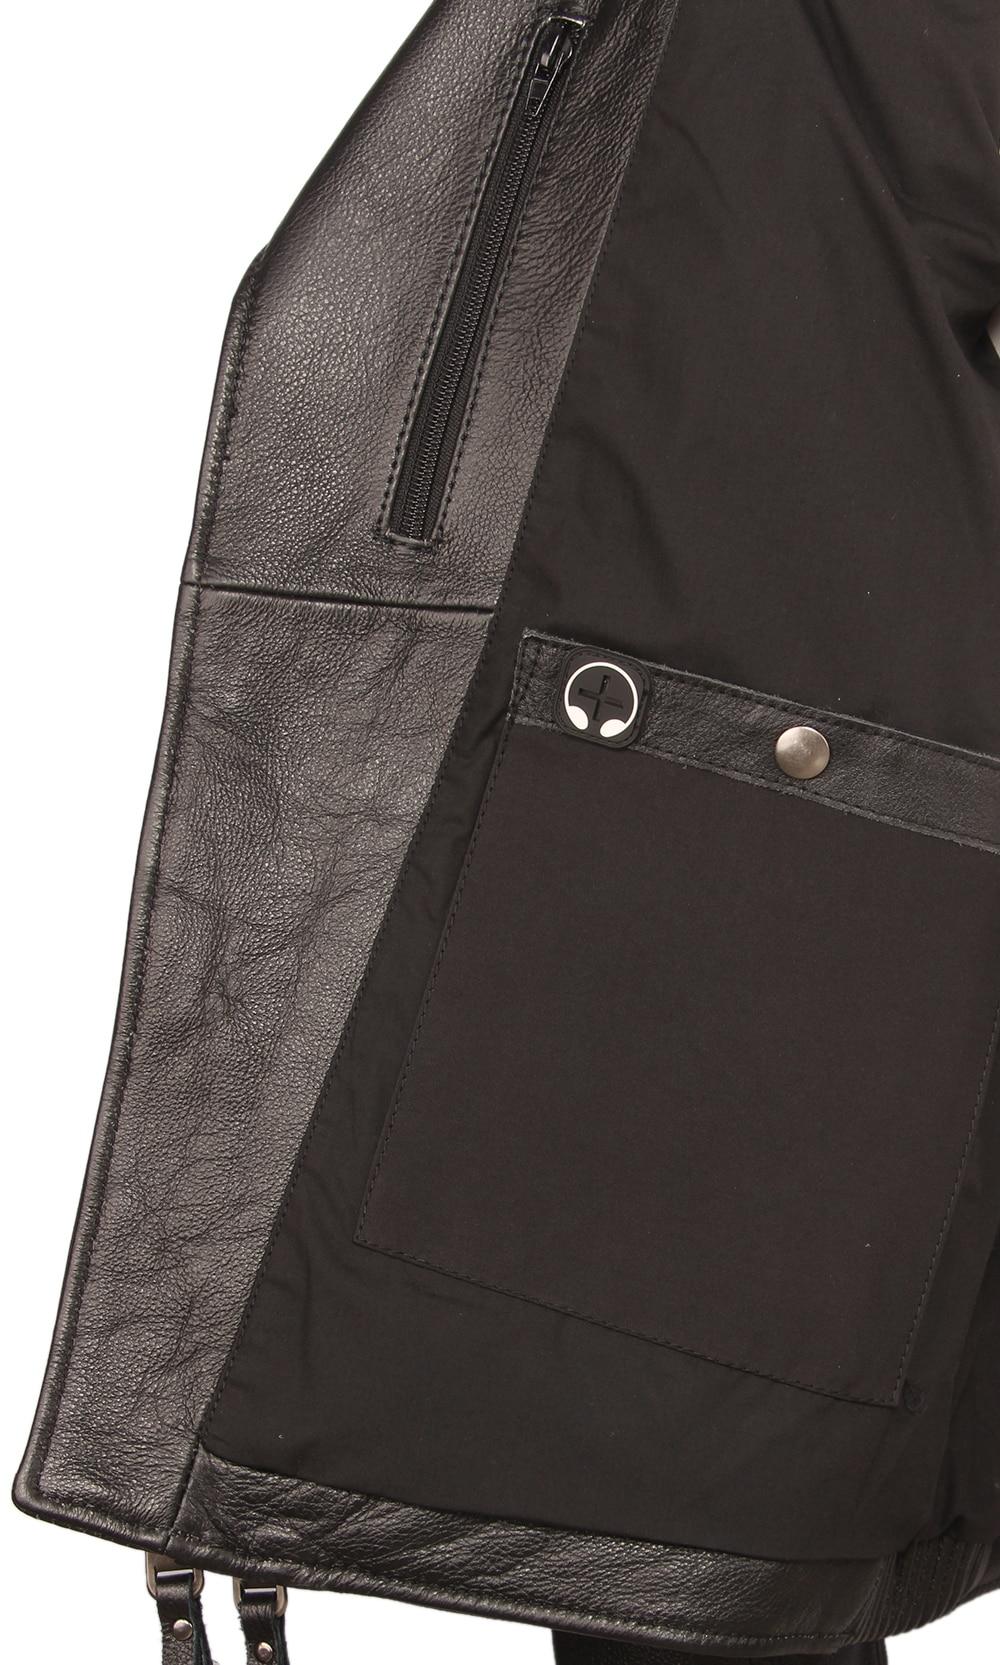 H1c117e1f5dcb4ee28765f61c0c202decA Vintage Motorcycle Jacket Slim Fit Thick Men Leather Jacket 100% Cowhide Moto Biker Jacket Man Leather Coat Winter Warm M455